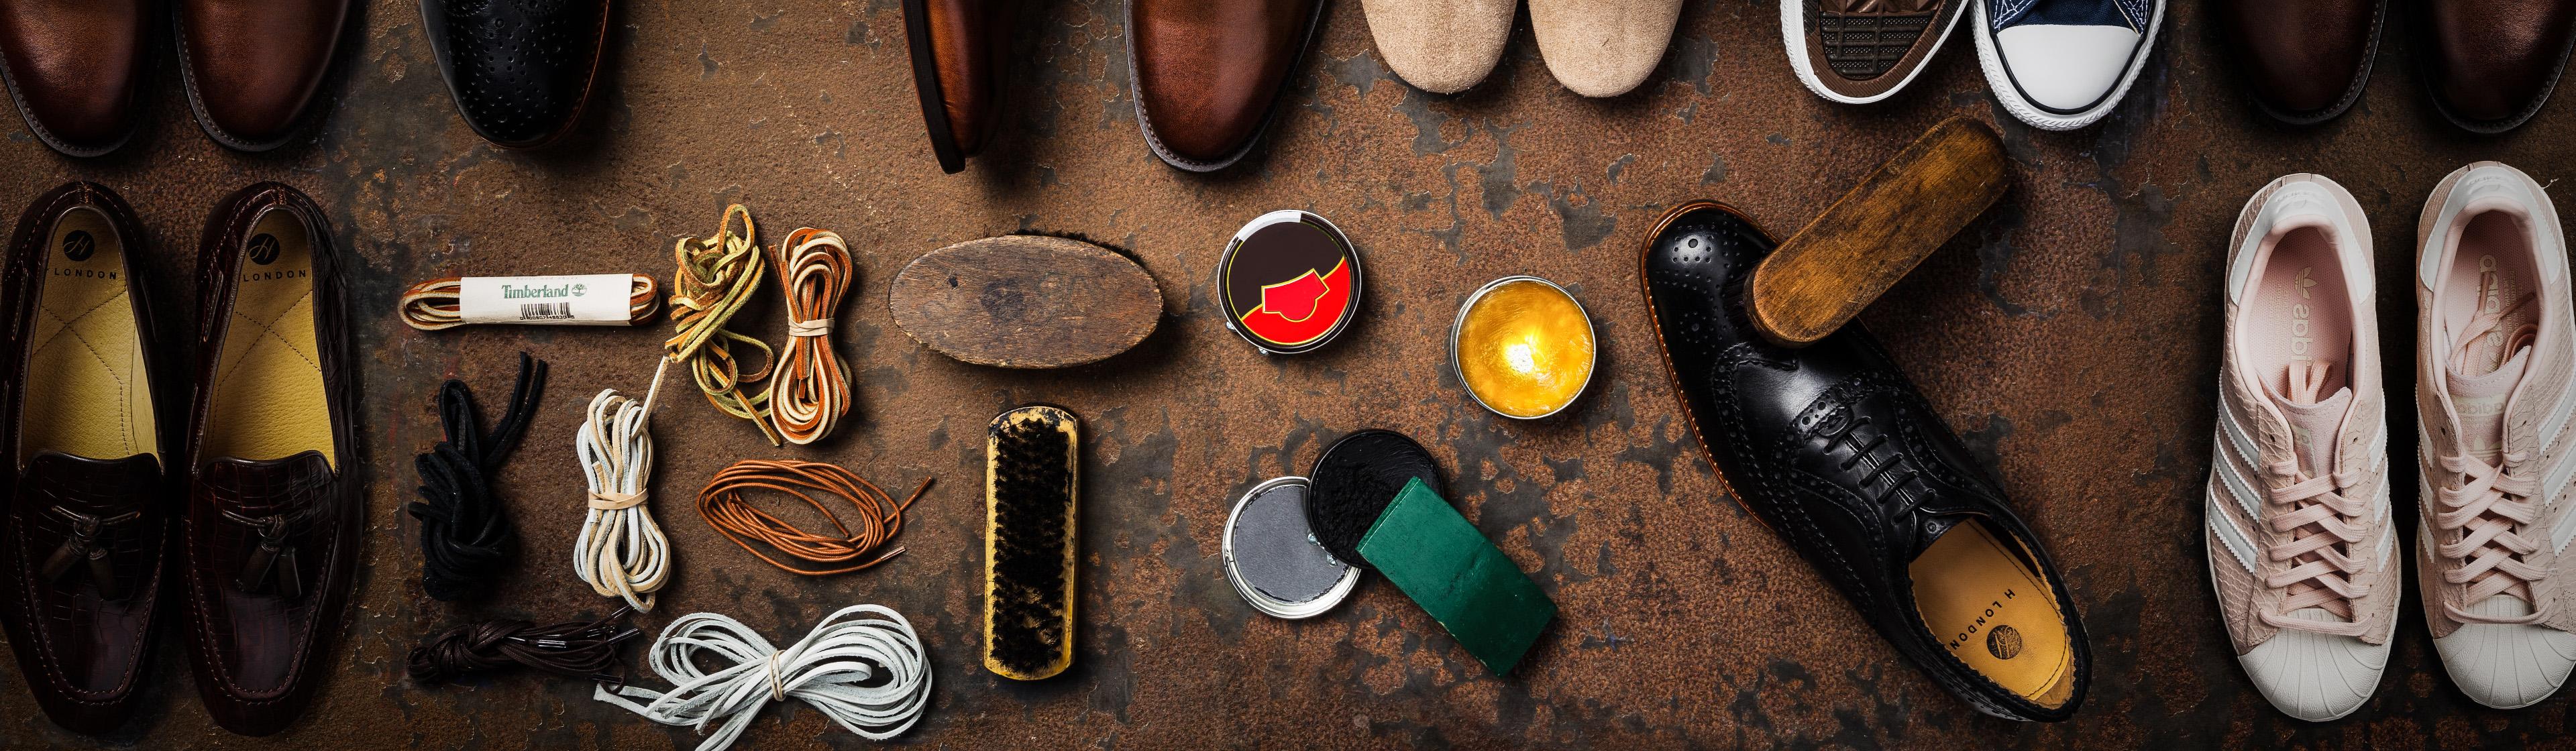 Footwear Care Guide